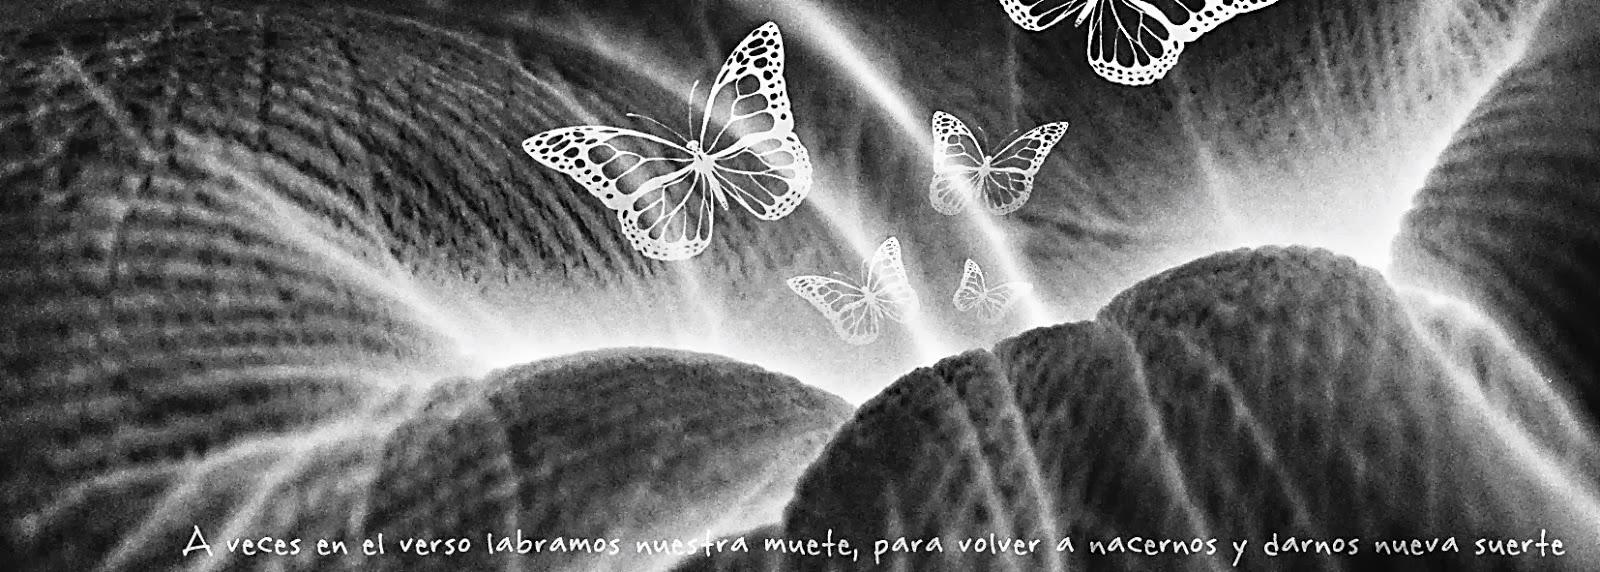 Como vuelan las mariposas